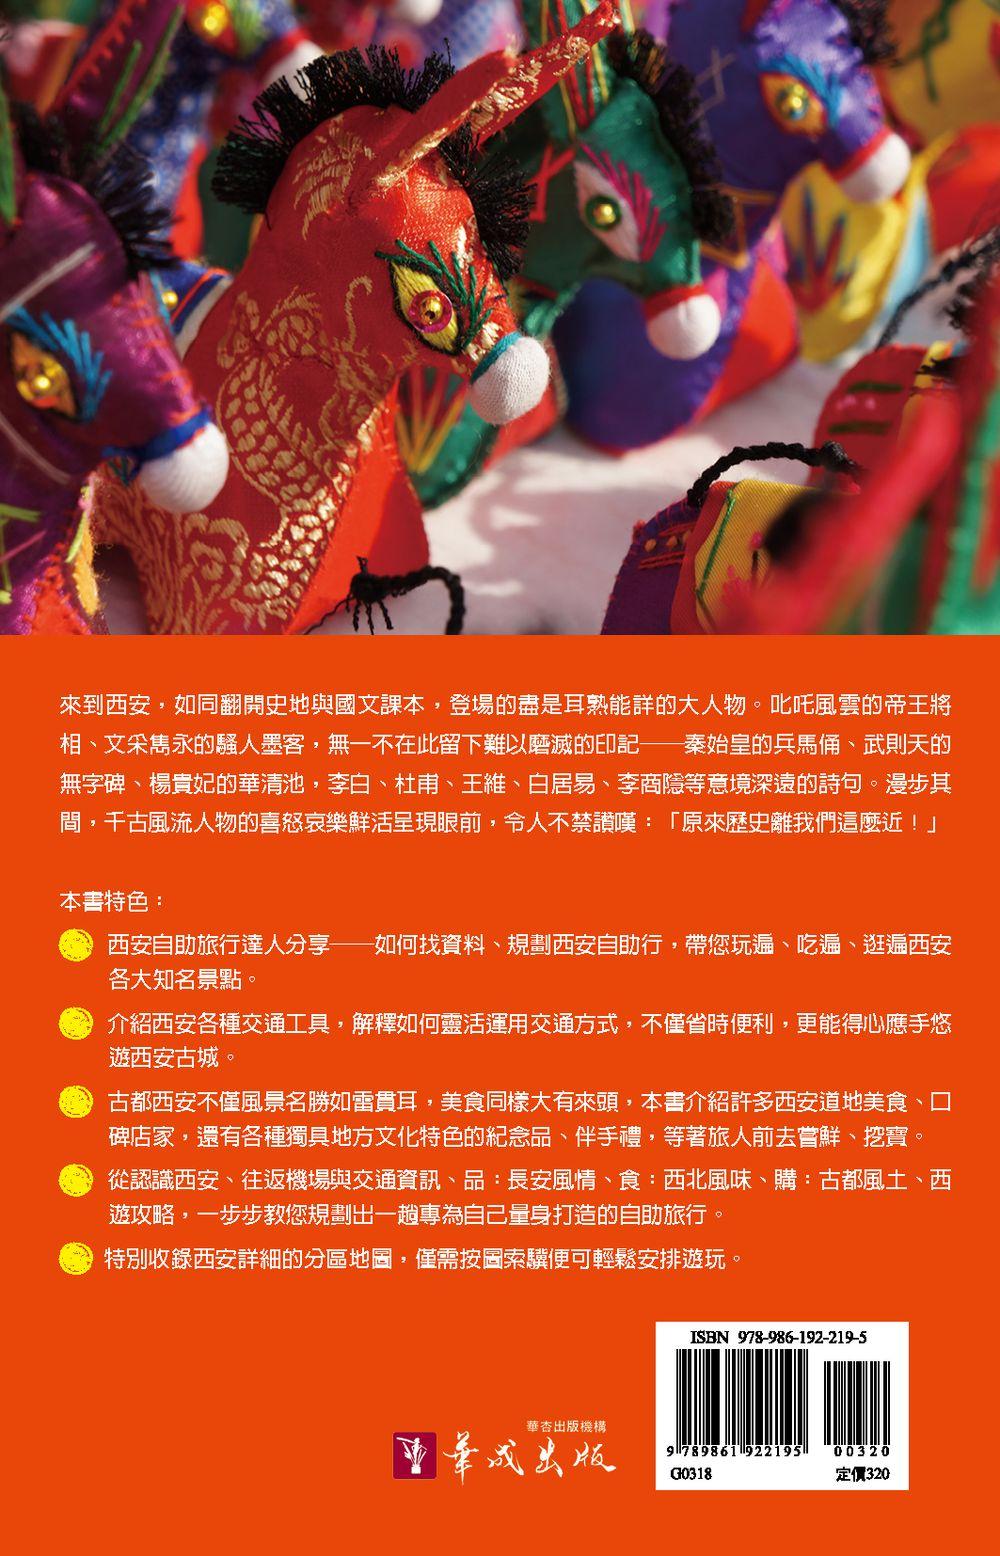 http://im2.book.com.tw/image/getImage?i=http://www.books.com.tw/img/001/064/78/0010647808_bf_01.jpg&v=53f70dd1&w=655&h=609